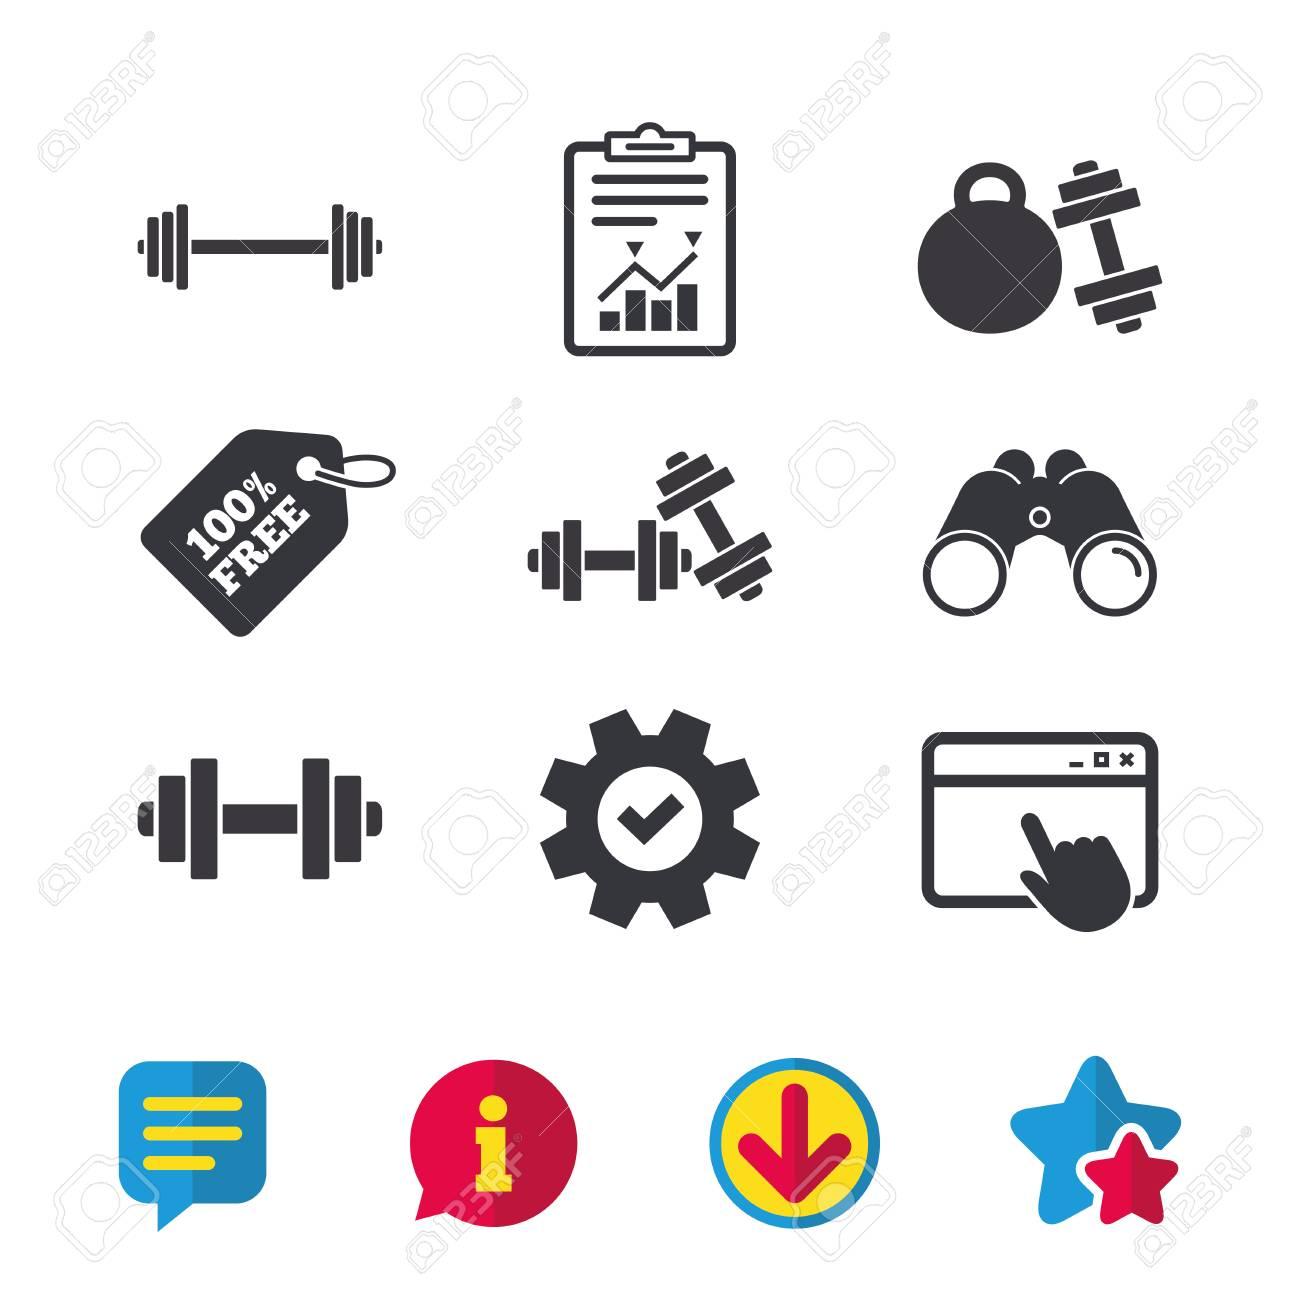 Dumbbells sign icons fitness sport symbols gym workout equipment dumbbells sign icons fitness sport symbols gym workout equipment browser window report biocorpaavc